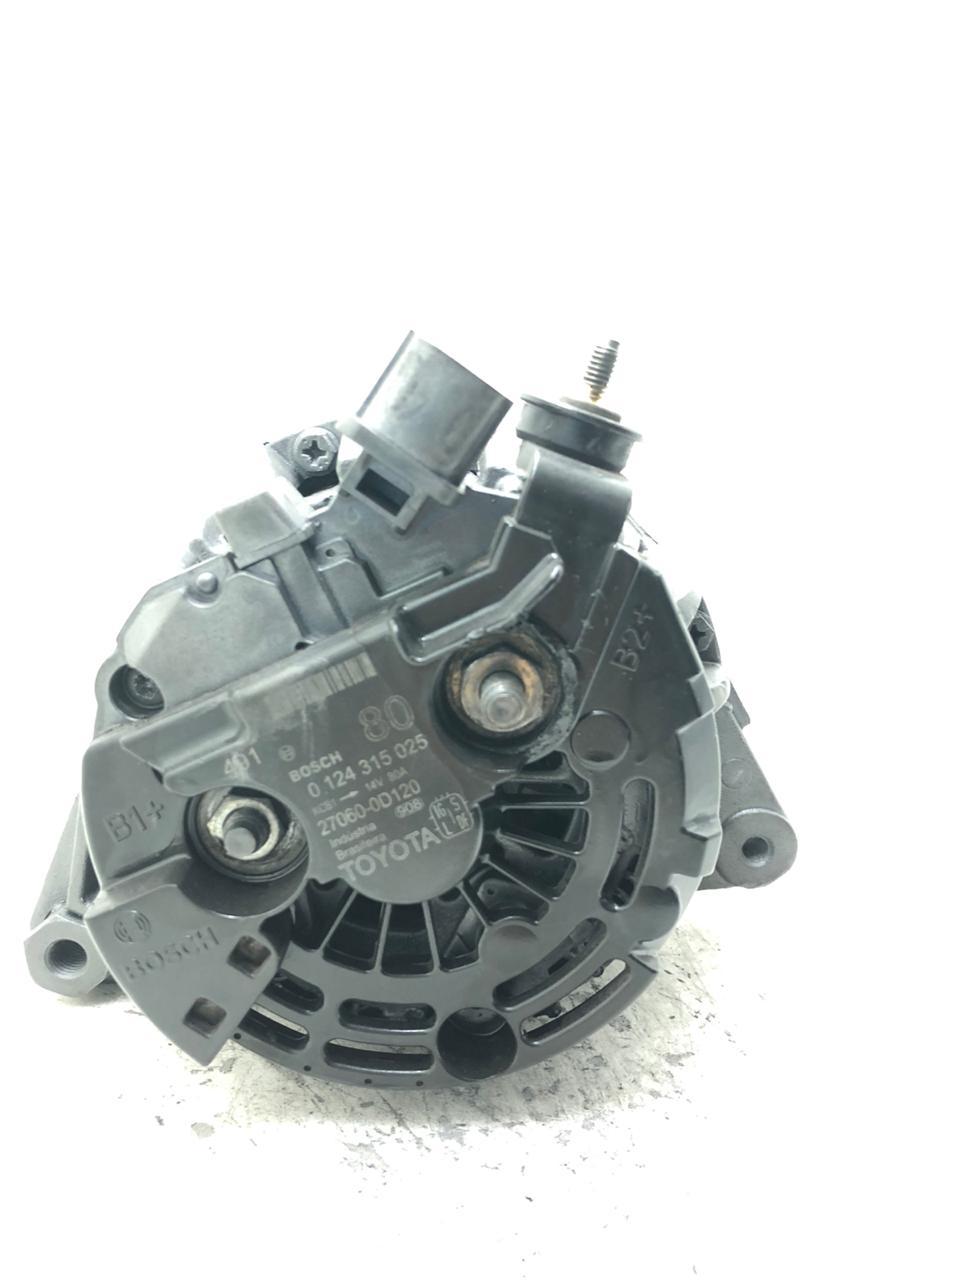 Alternador Toyota Corolla 1.6 1.8 2000 ATE 2007 14V 80AMP 0124315025 270600D120